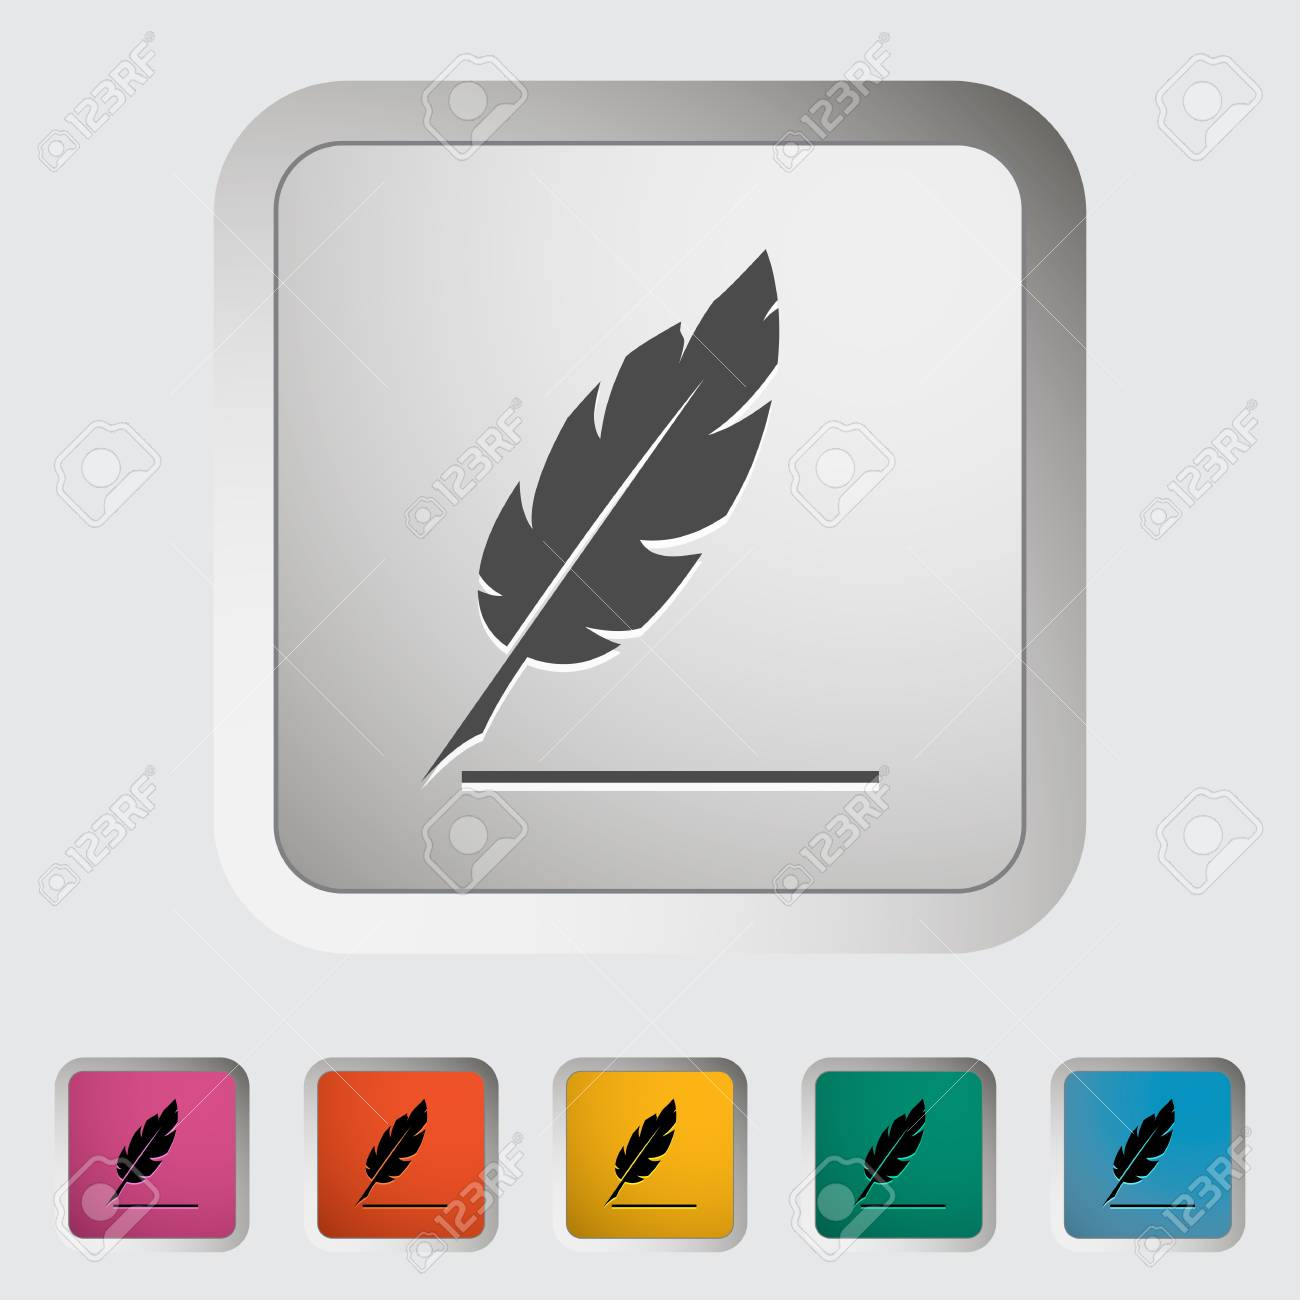 Feather  Single icon illustration Stock Vector - 21528497